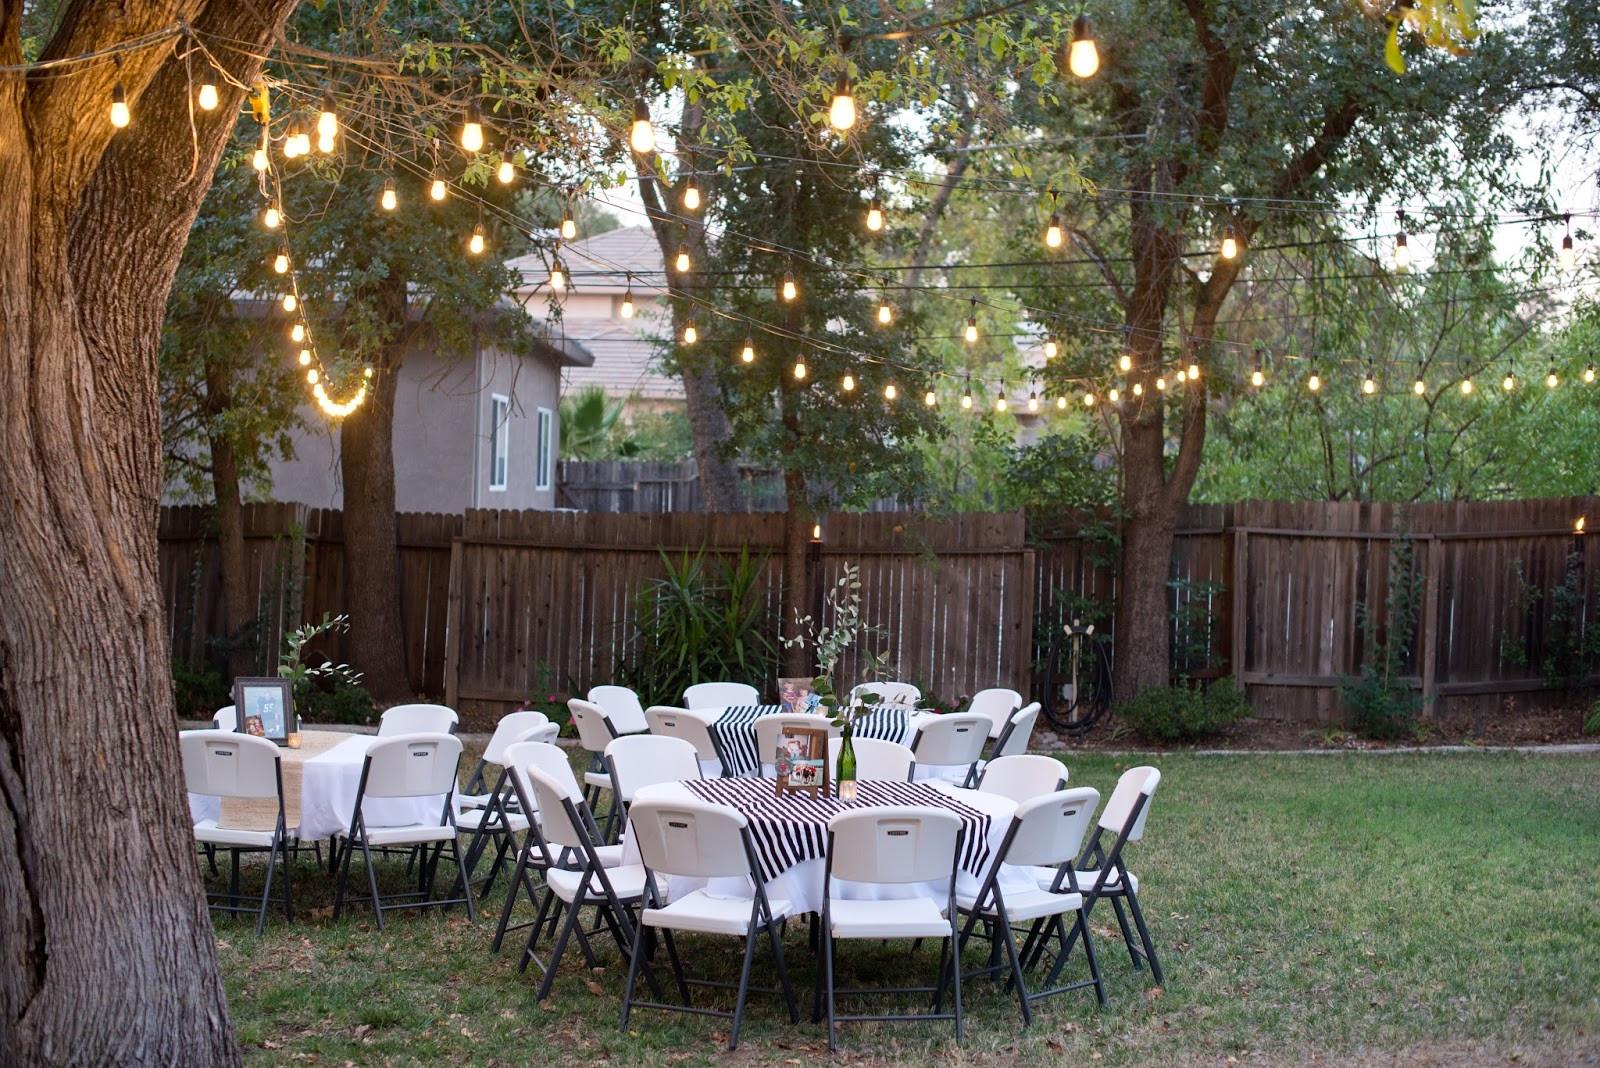 Birthday Party Ideas Backyard  Domestic Fashionista Backyard Birthday Party For the Guy